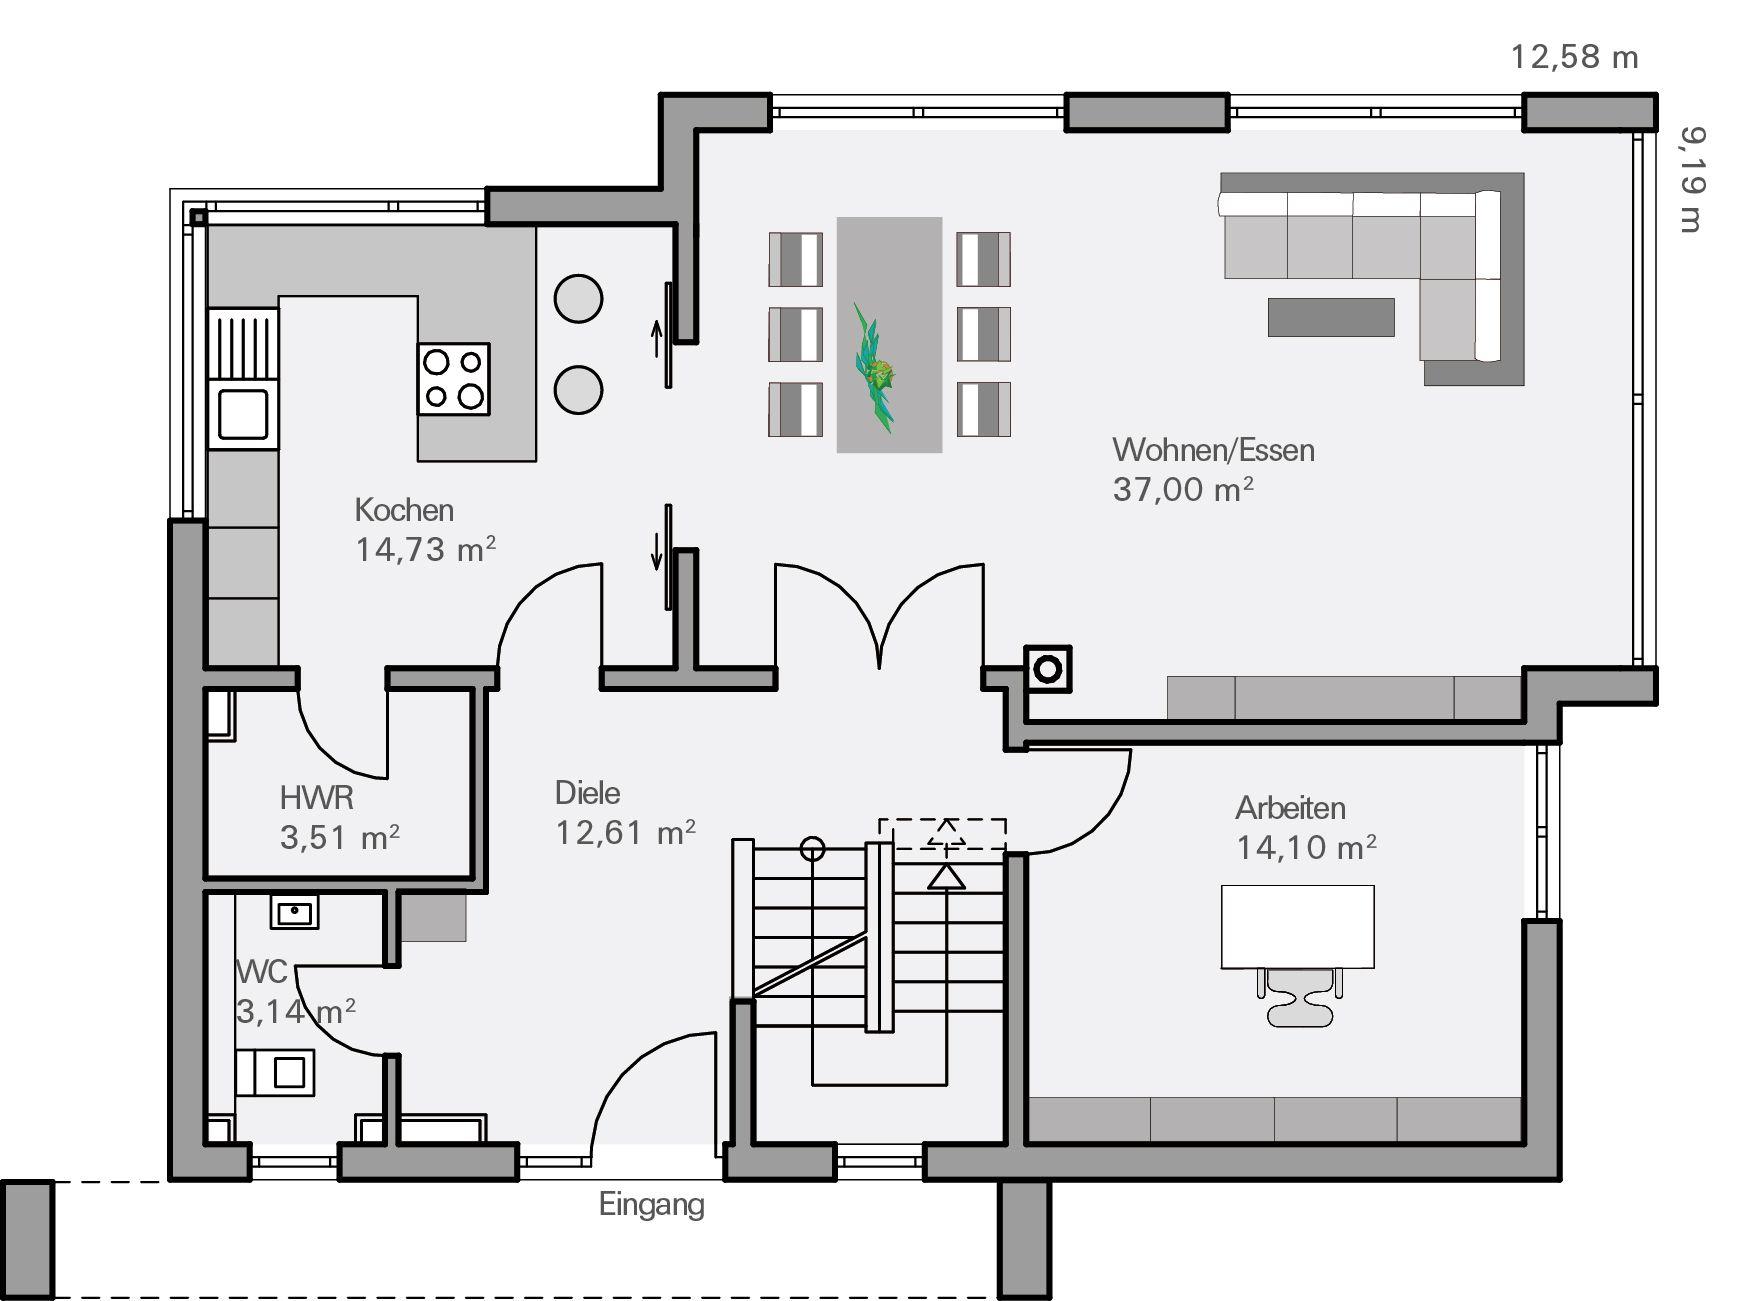 grundriss eg | houses and ideas | pinterest | haus und modern